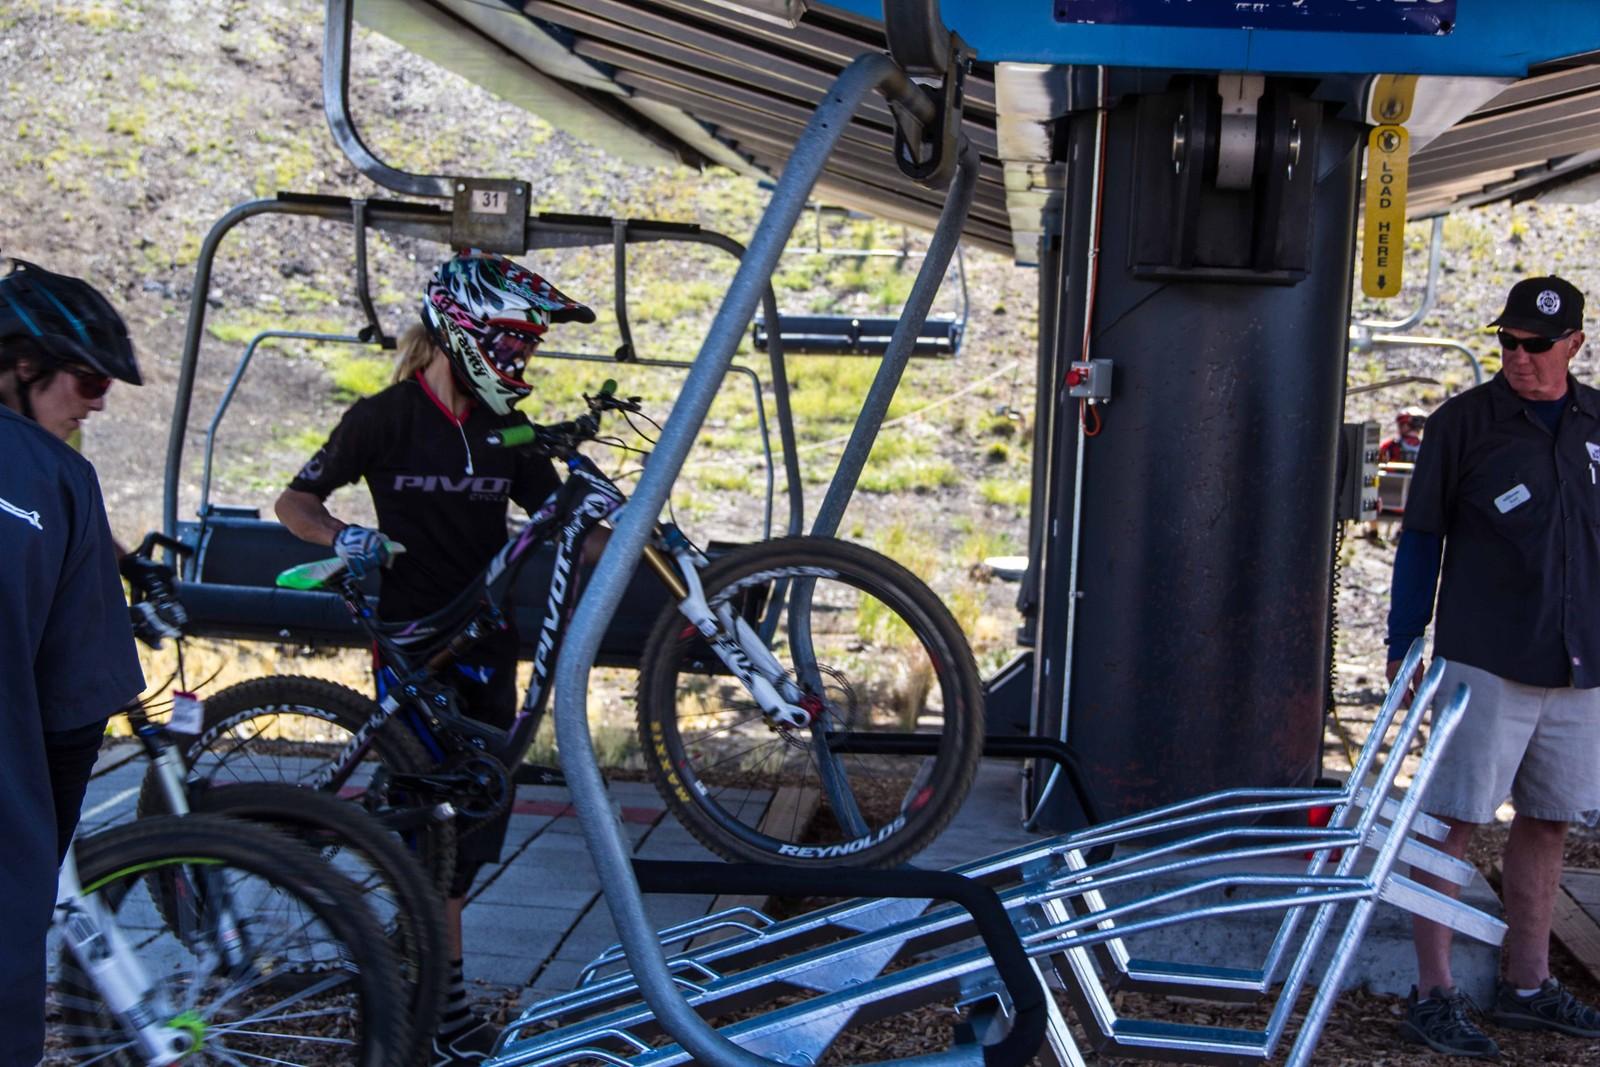 Loading up!  - Yuroshek - Mountain Biking Pictures - Vital MTB